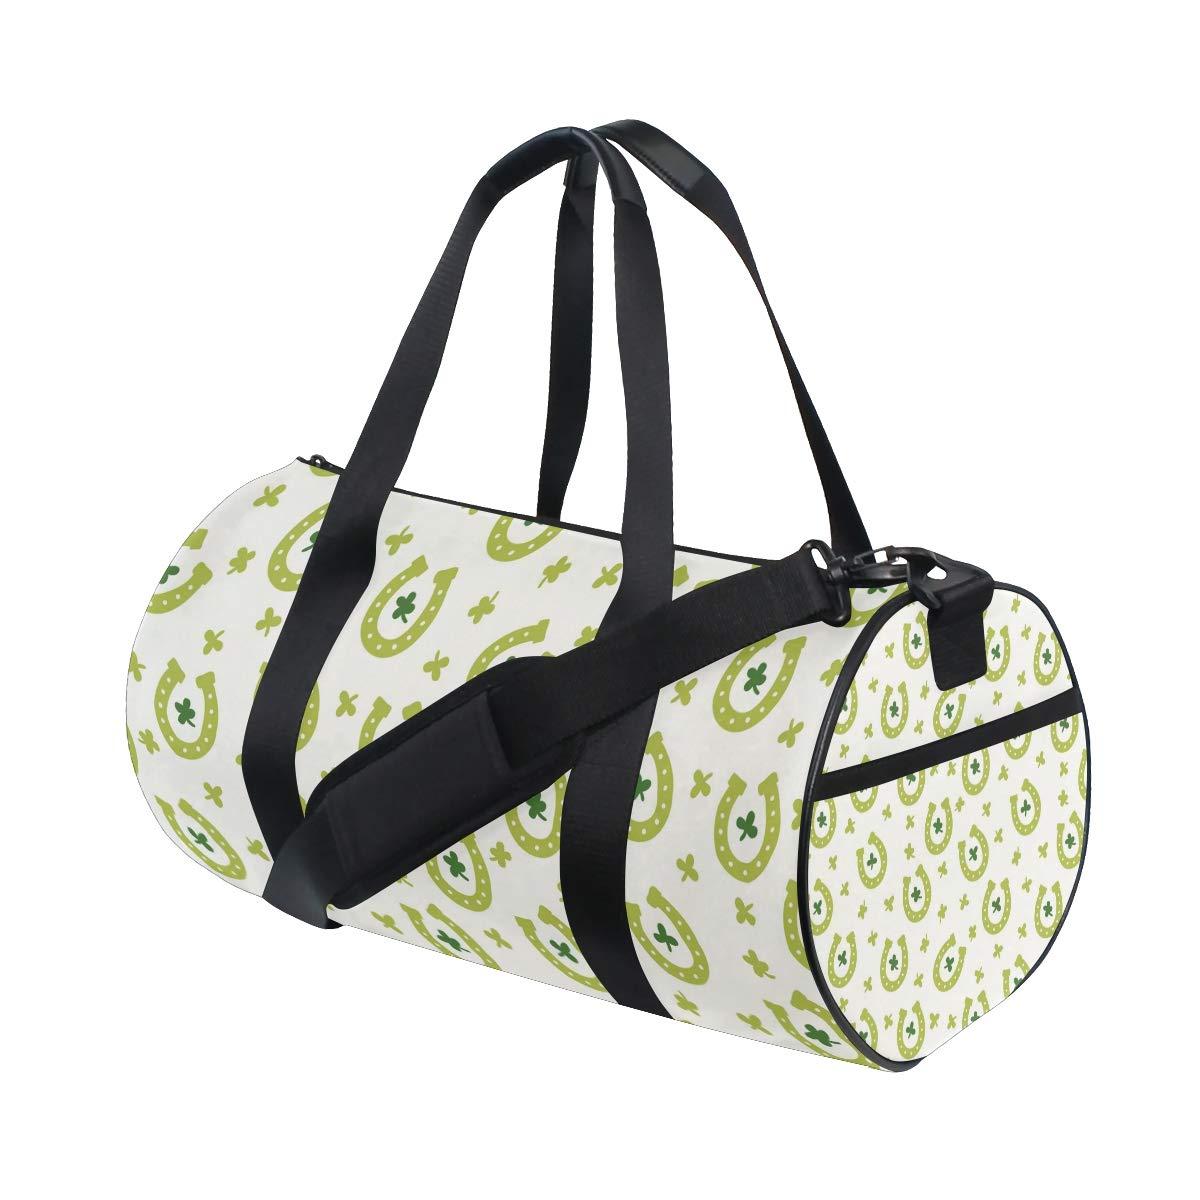 MALPLENA Birds Feathers Painting Drum gym duffel bag women Travel Bag